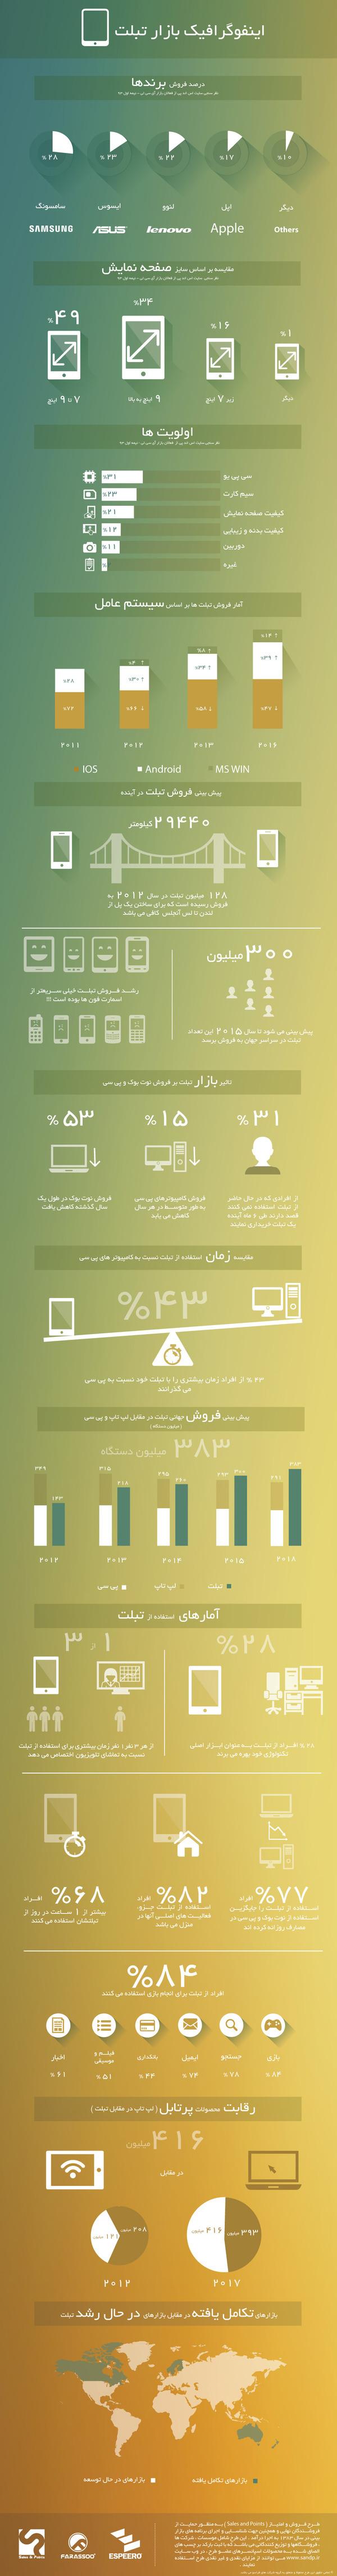 TabletInfographic.jpg